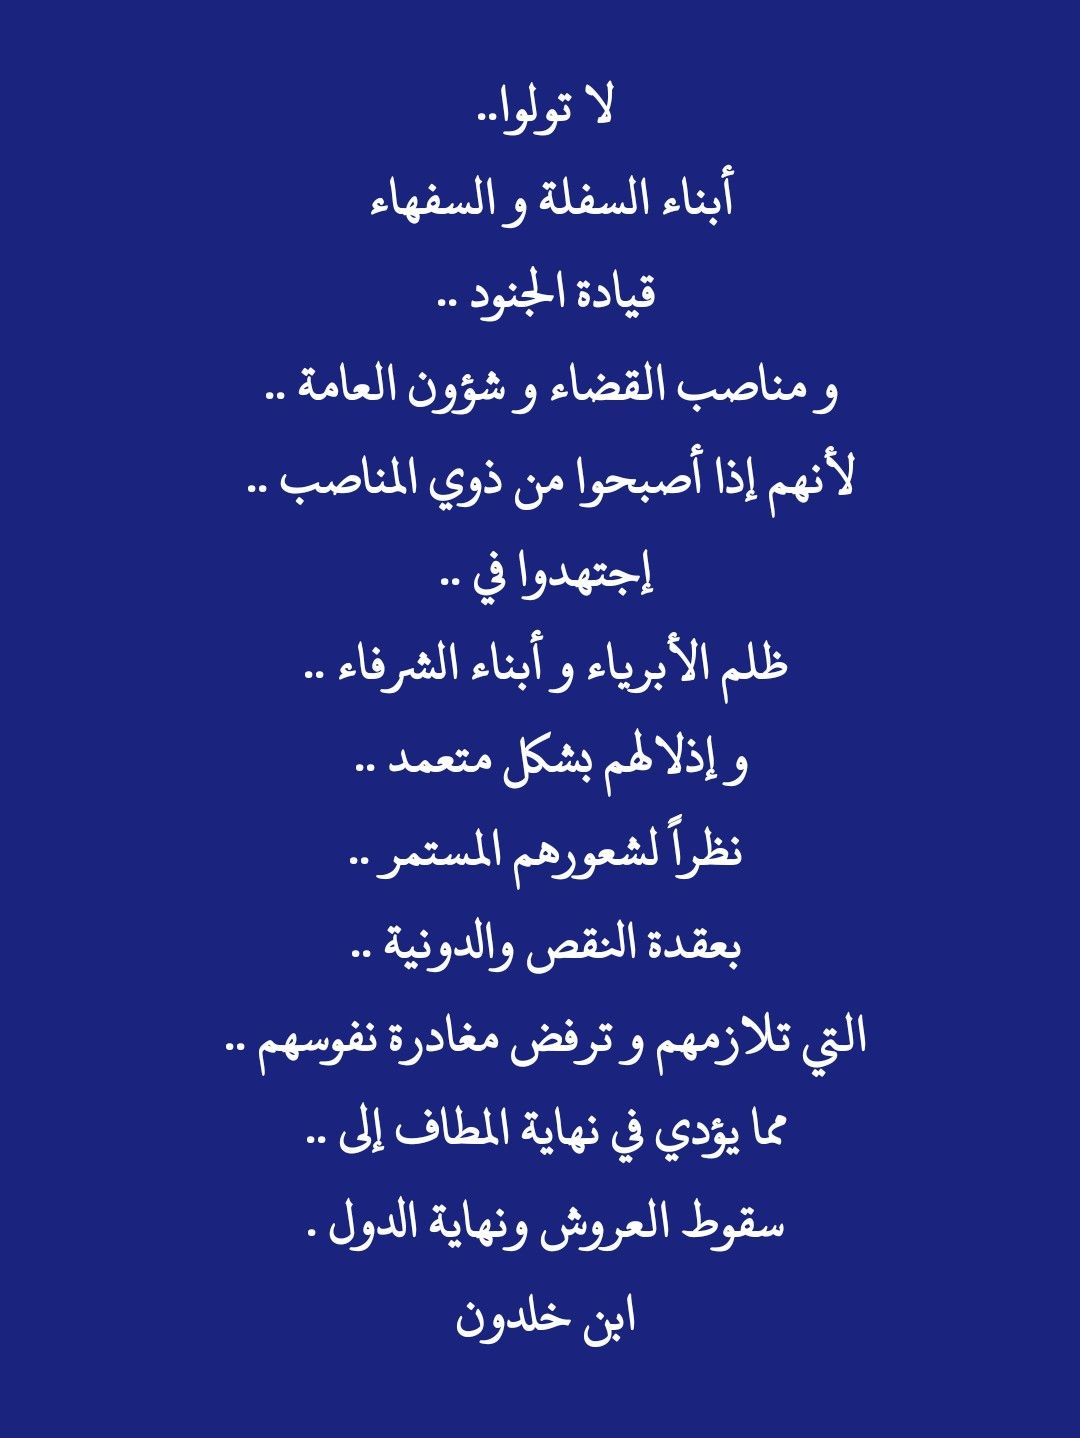 Pin By Hoda El Mallah On أقوال و كلمات و حكم و مواعظ و دعاء Weather Screenshot Weather Screenshots